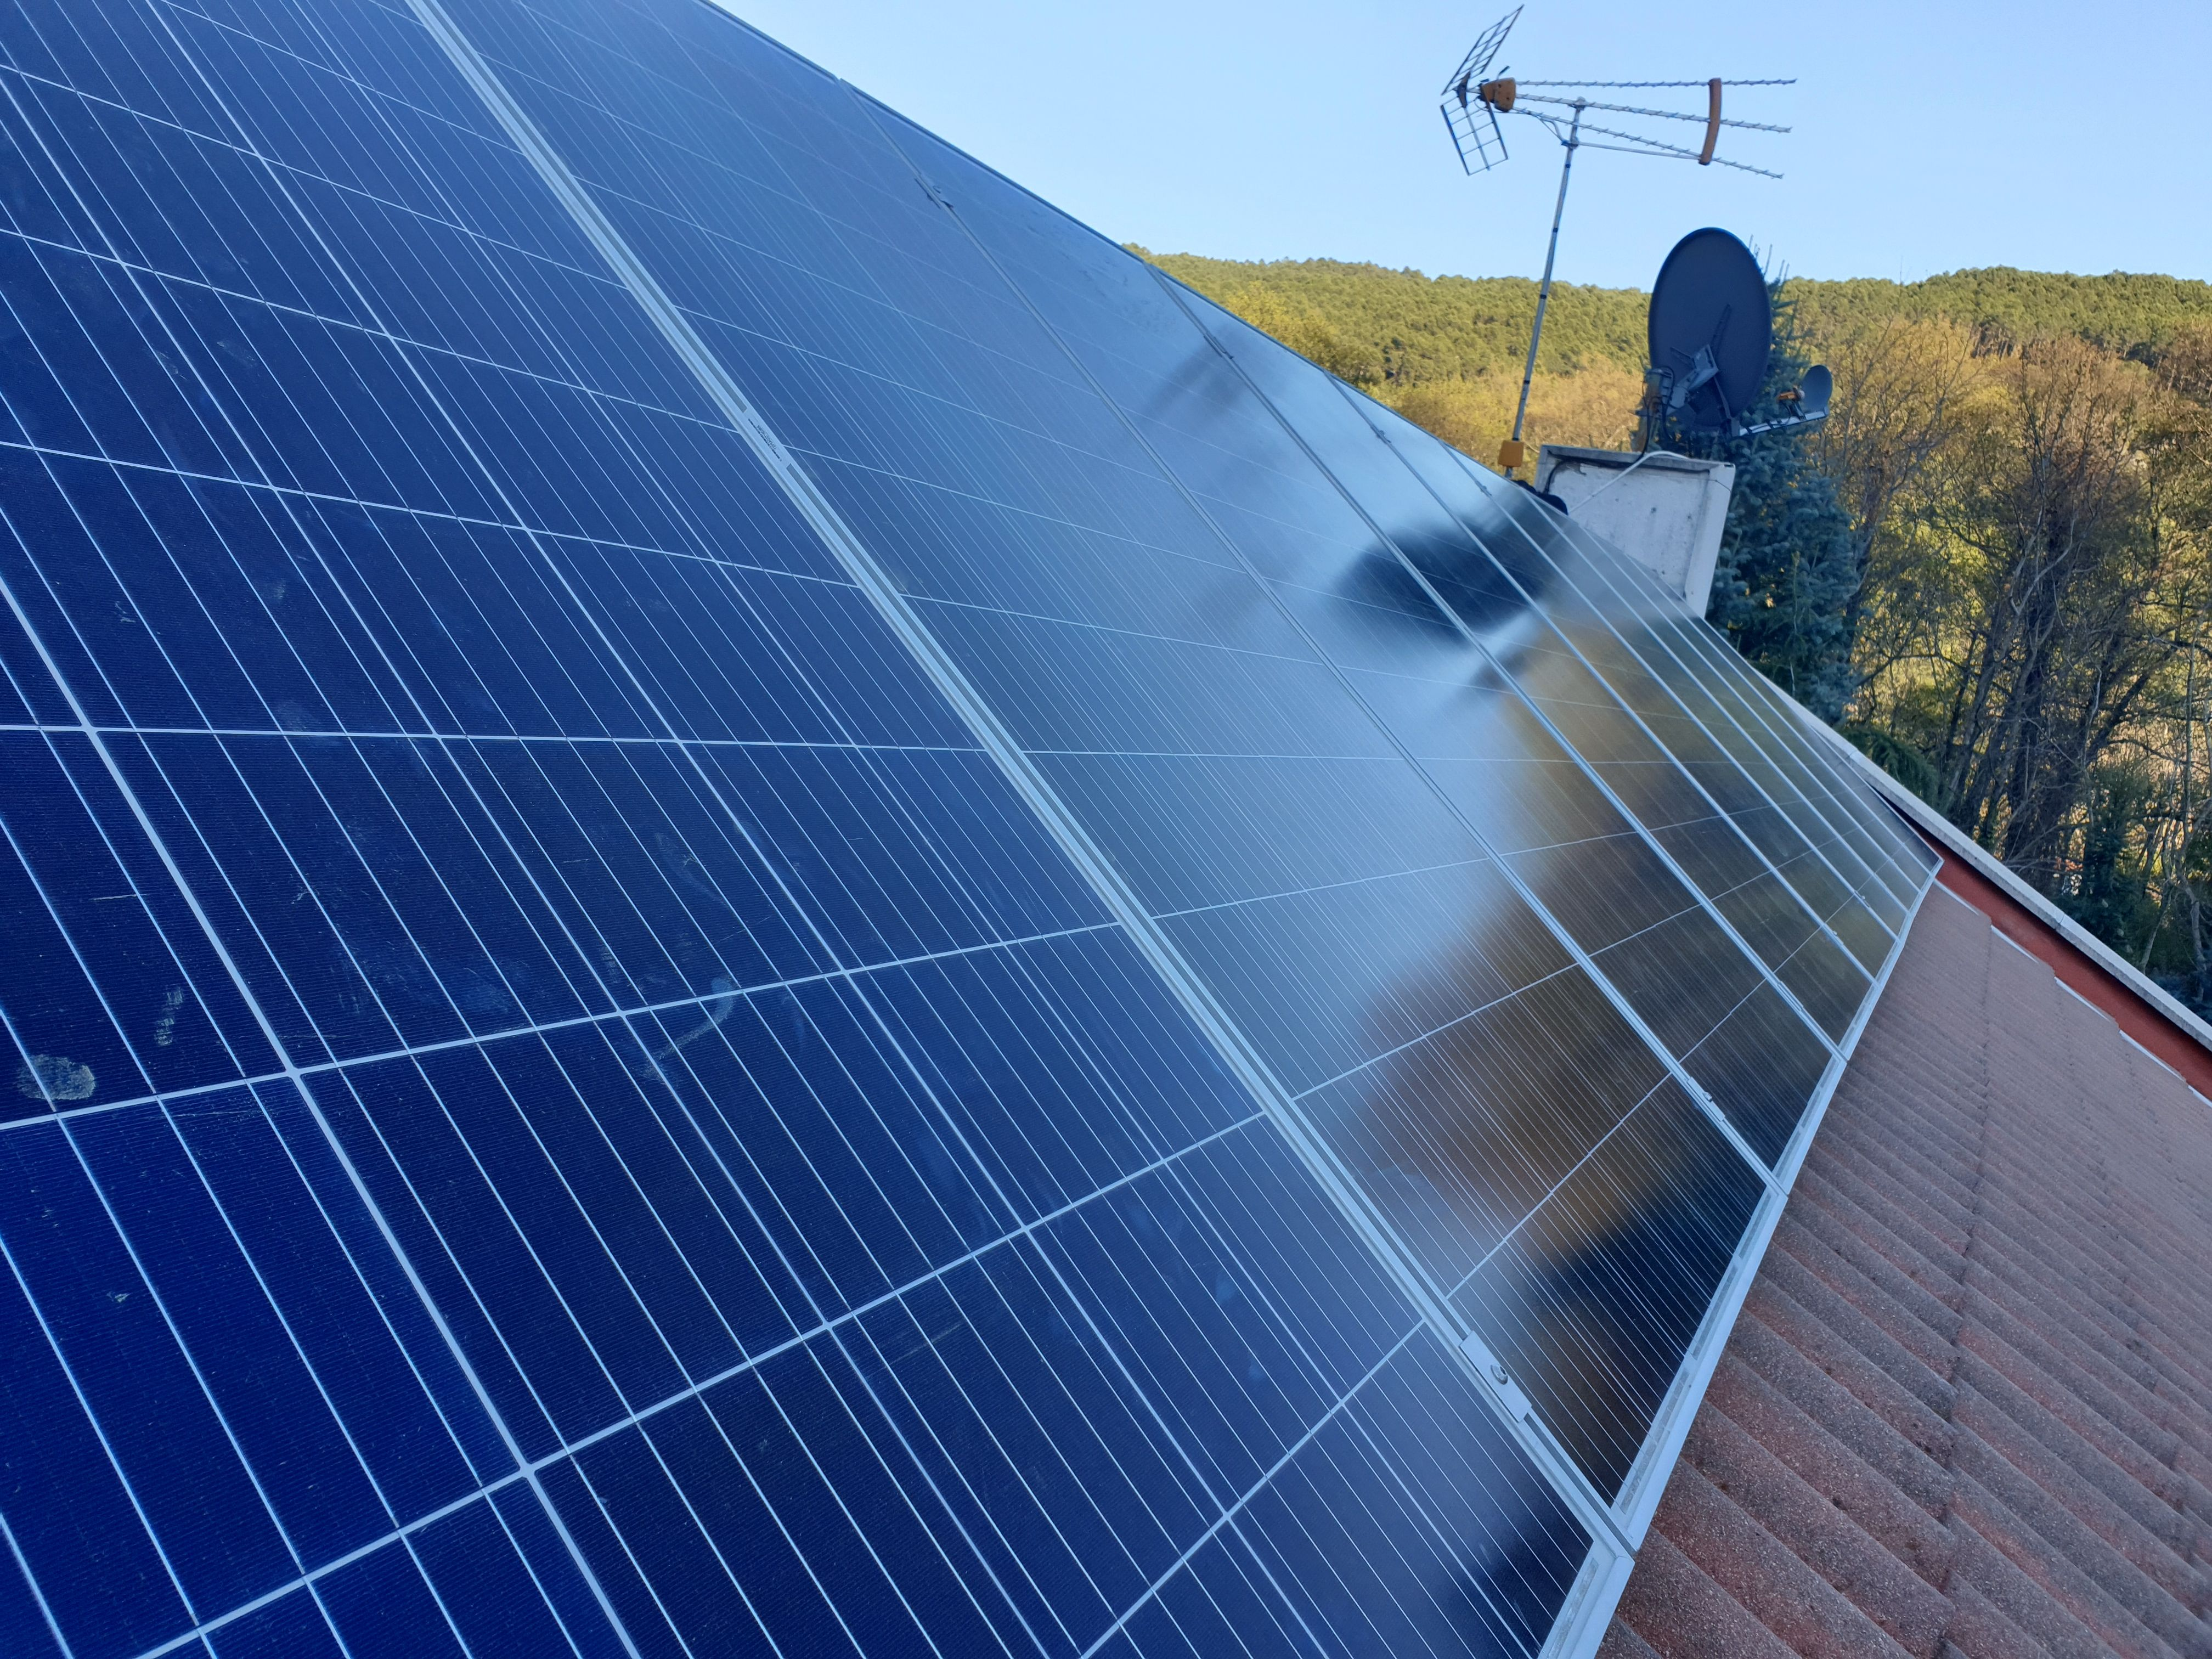 Energía solar: Servicios de Gil-Qui, group